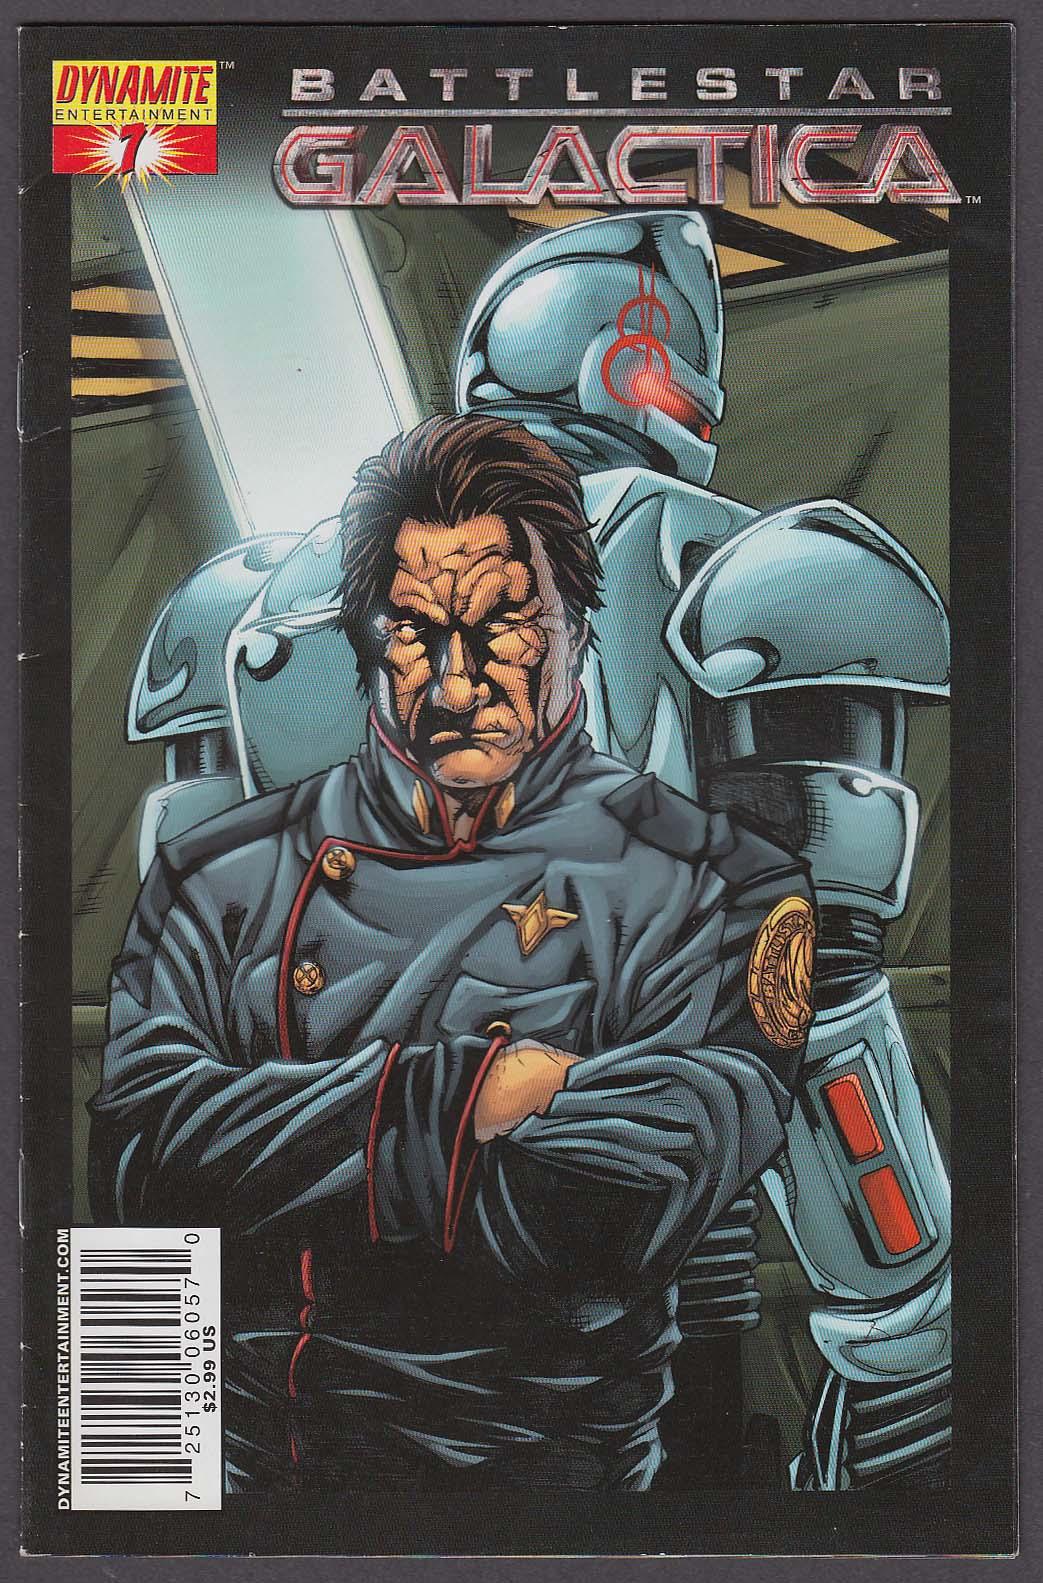 BATTLESTAR GALACTICA #7 Dynamite comic book 2007 1st Printing